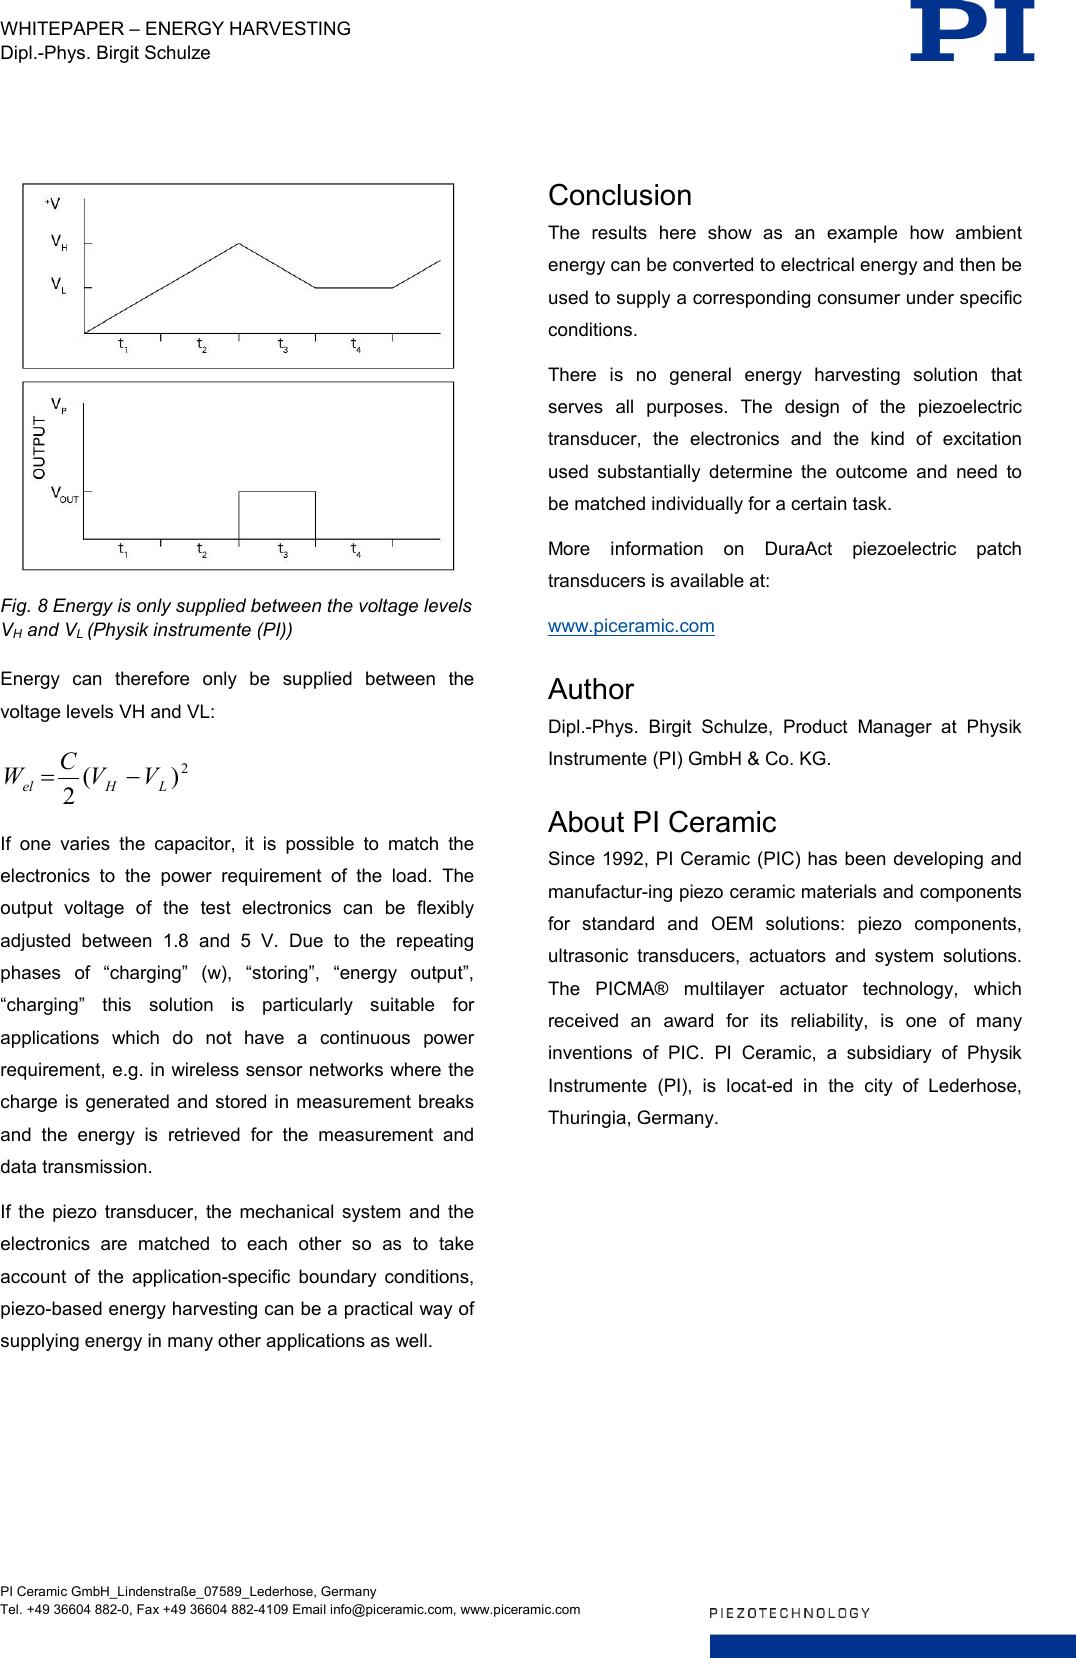 Physik Instrumente WP Pi1068 Energy Harvesting EN